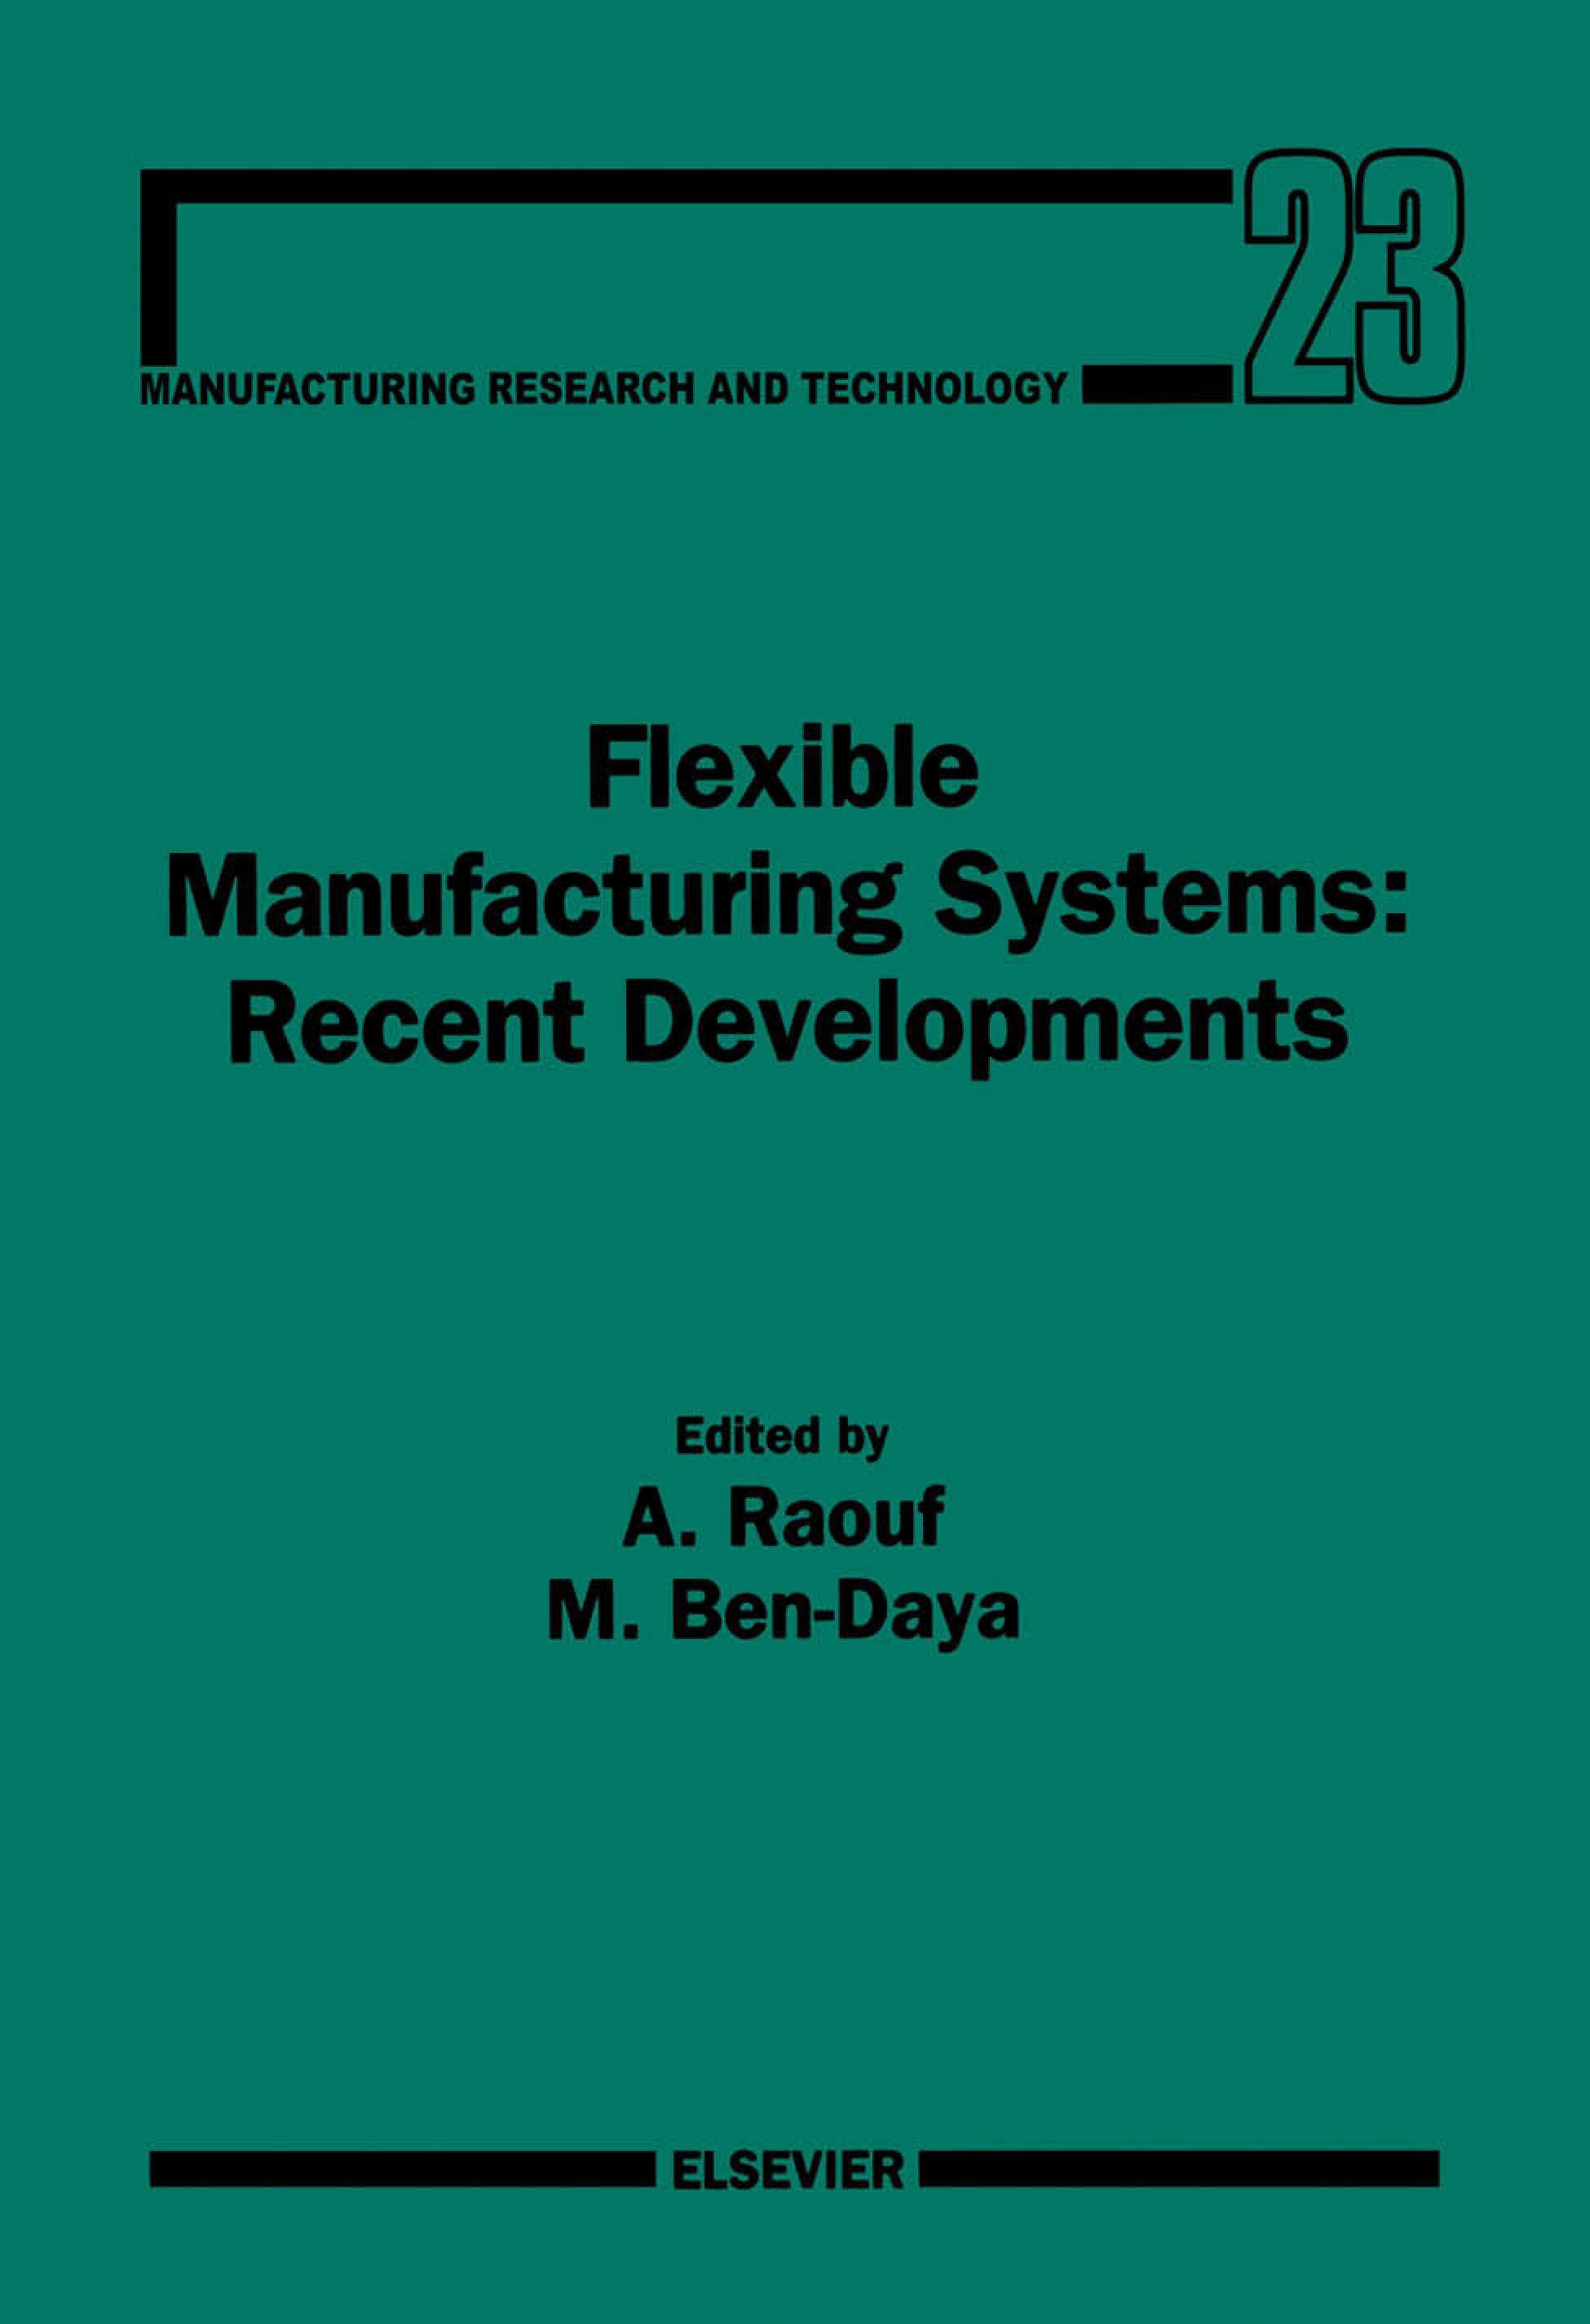 Flexible Manufacturing Systems: Recent Developments: Recent Developments EB9780080531694